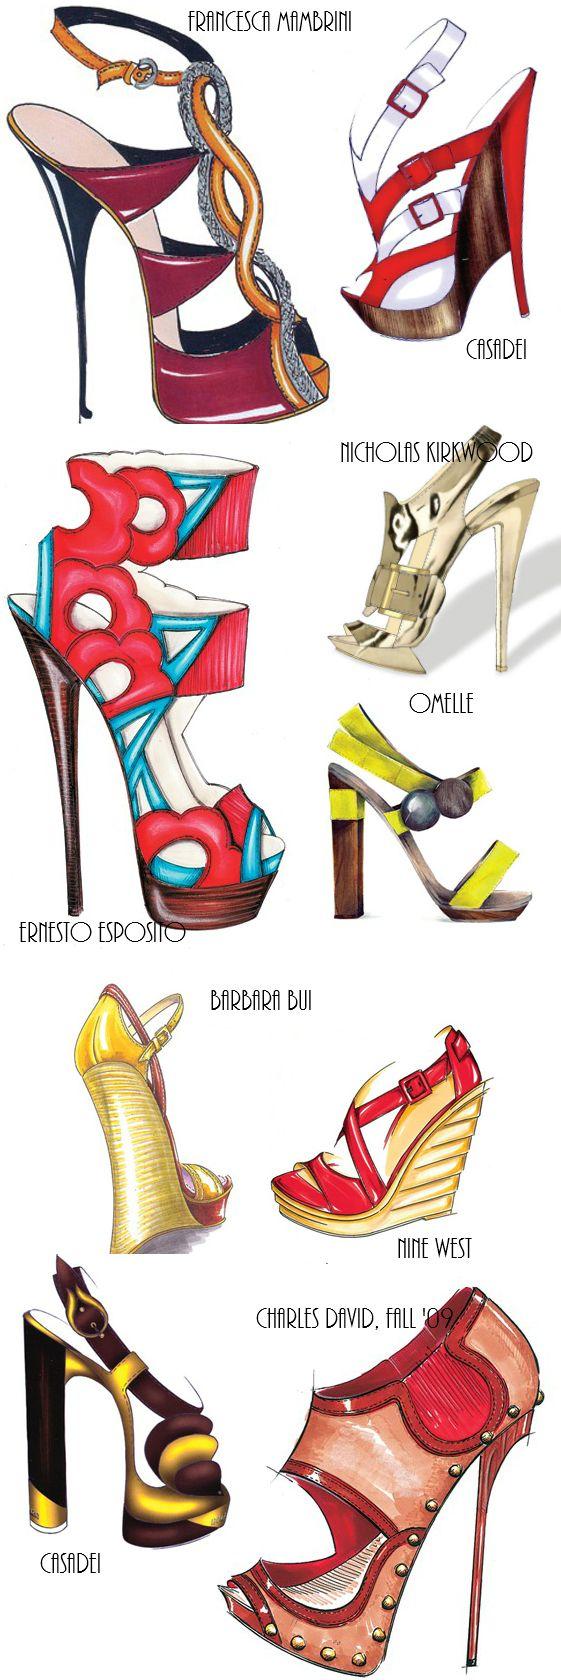 Earth ✵Wheel ✵ Sky✵ Caravan: Shoes Sketches